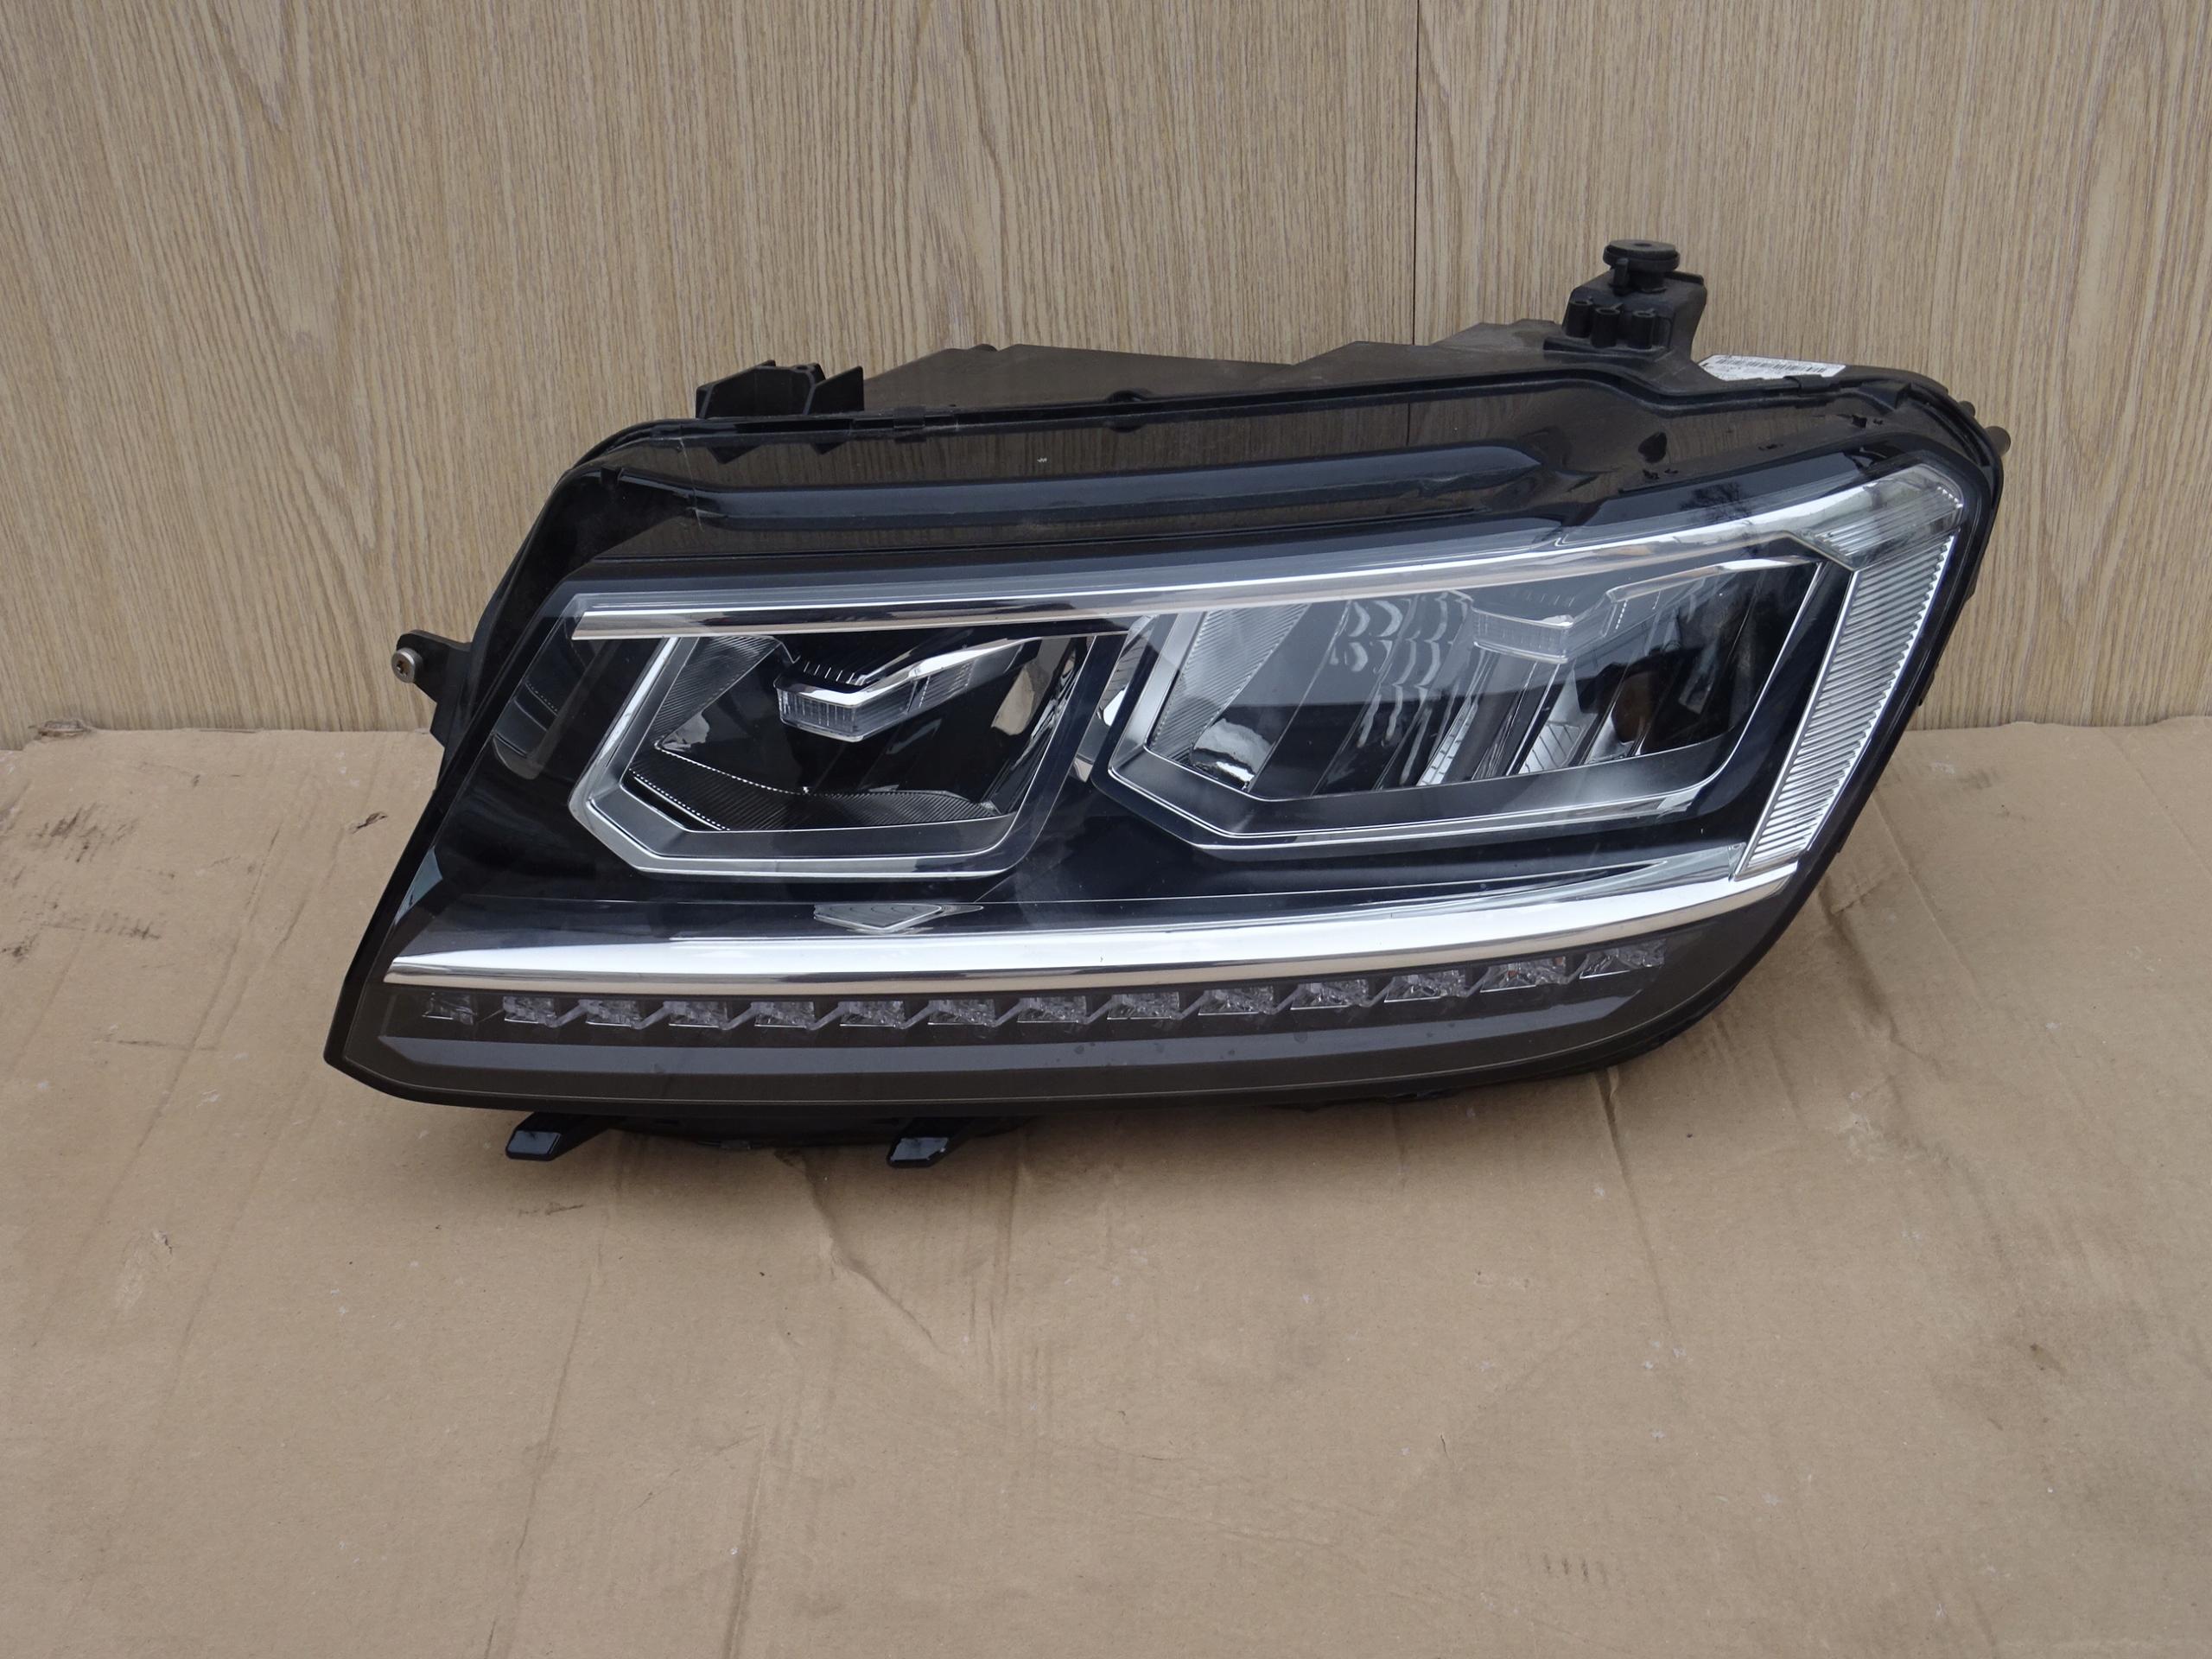 LAMPA PRZEDNIA LEWA VW TIGUAN FULL LED 5NB941035B